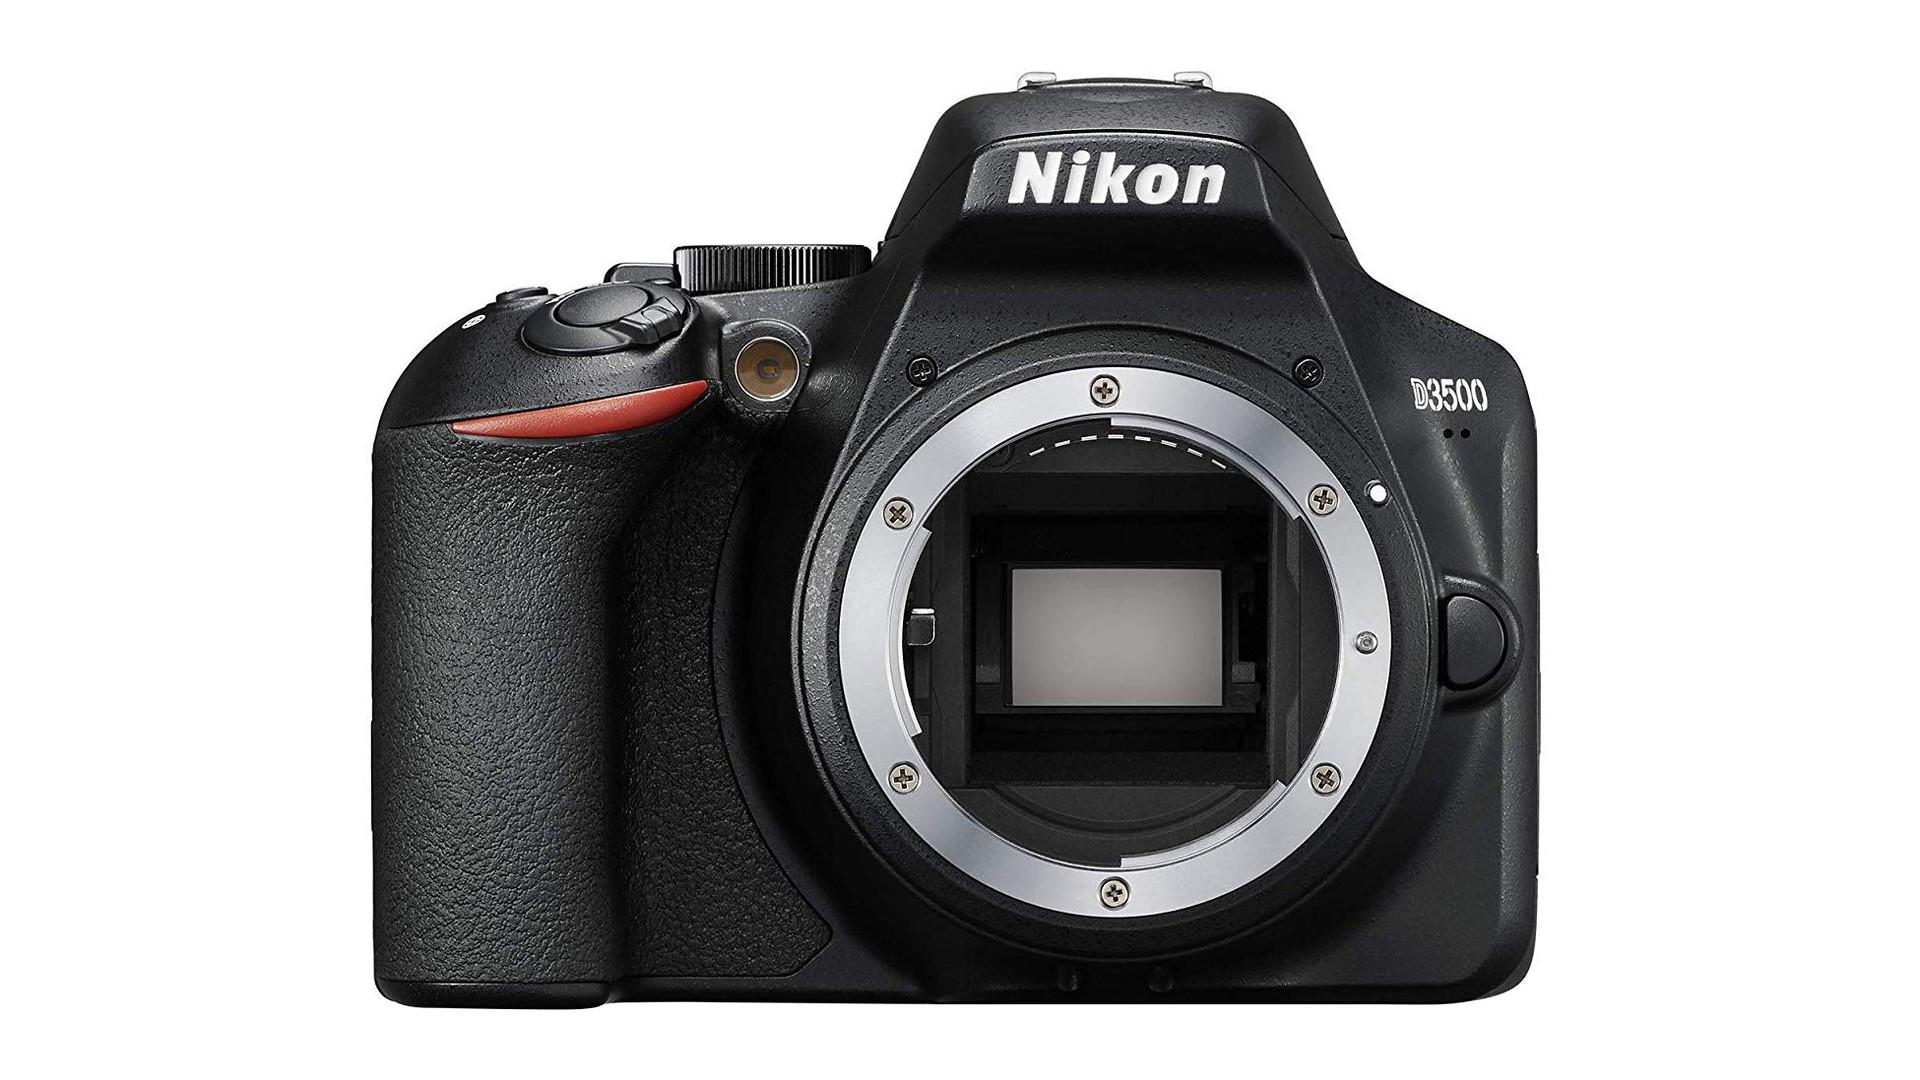 Nikon D3500 DSLR camera body